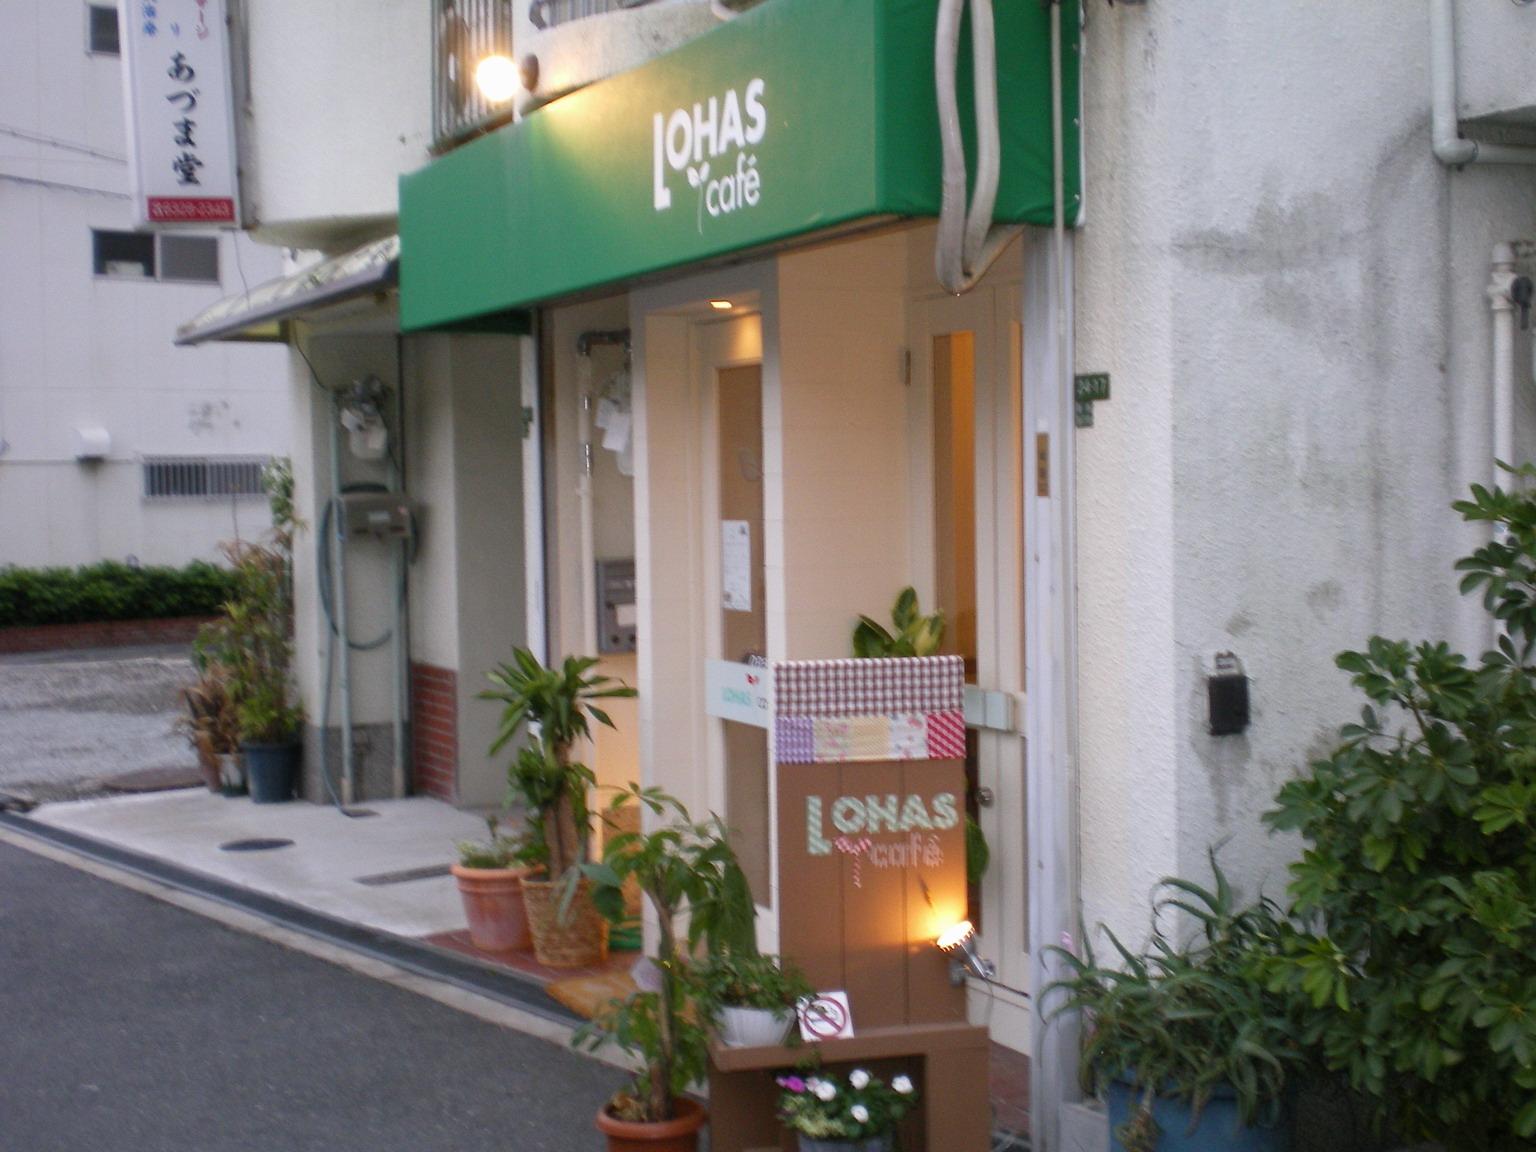 LOHAS CAFE